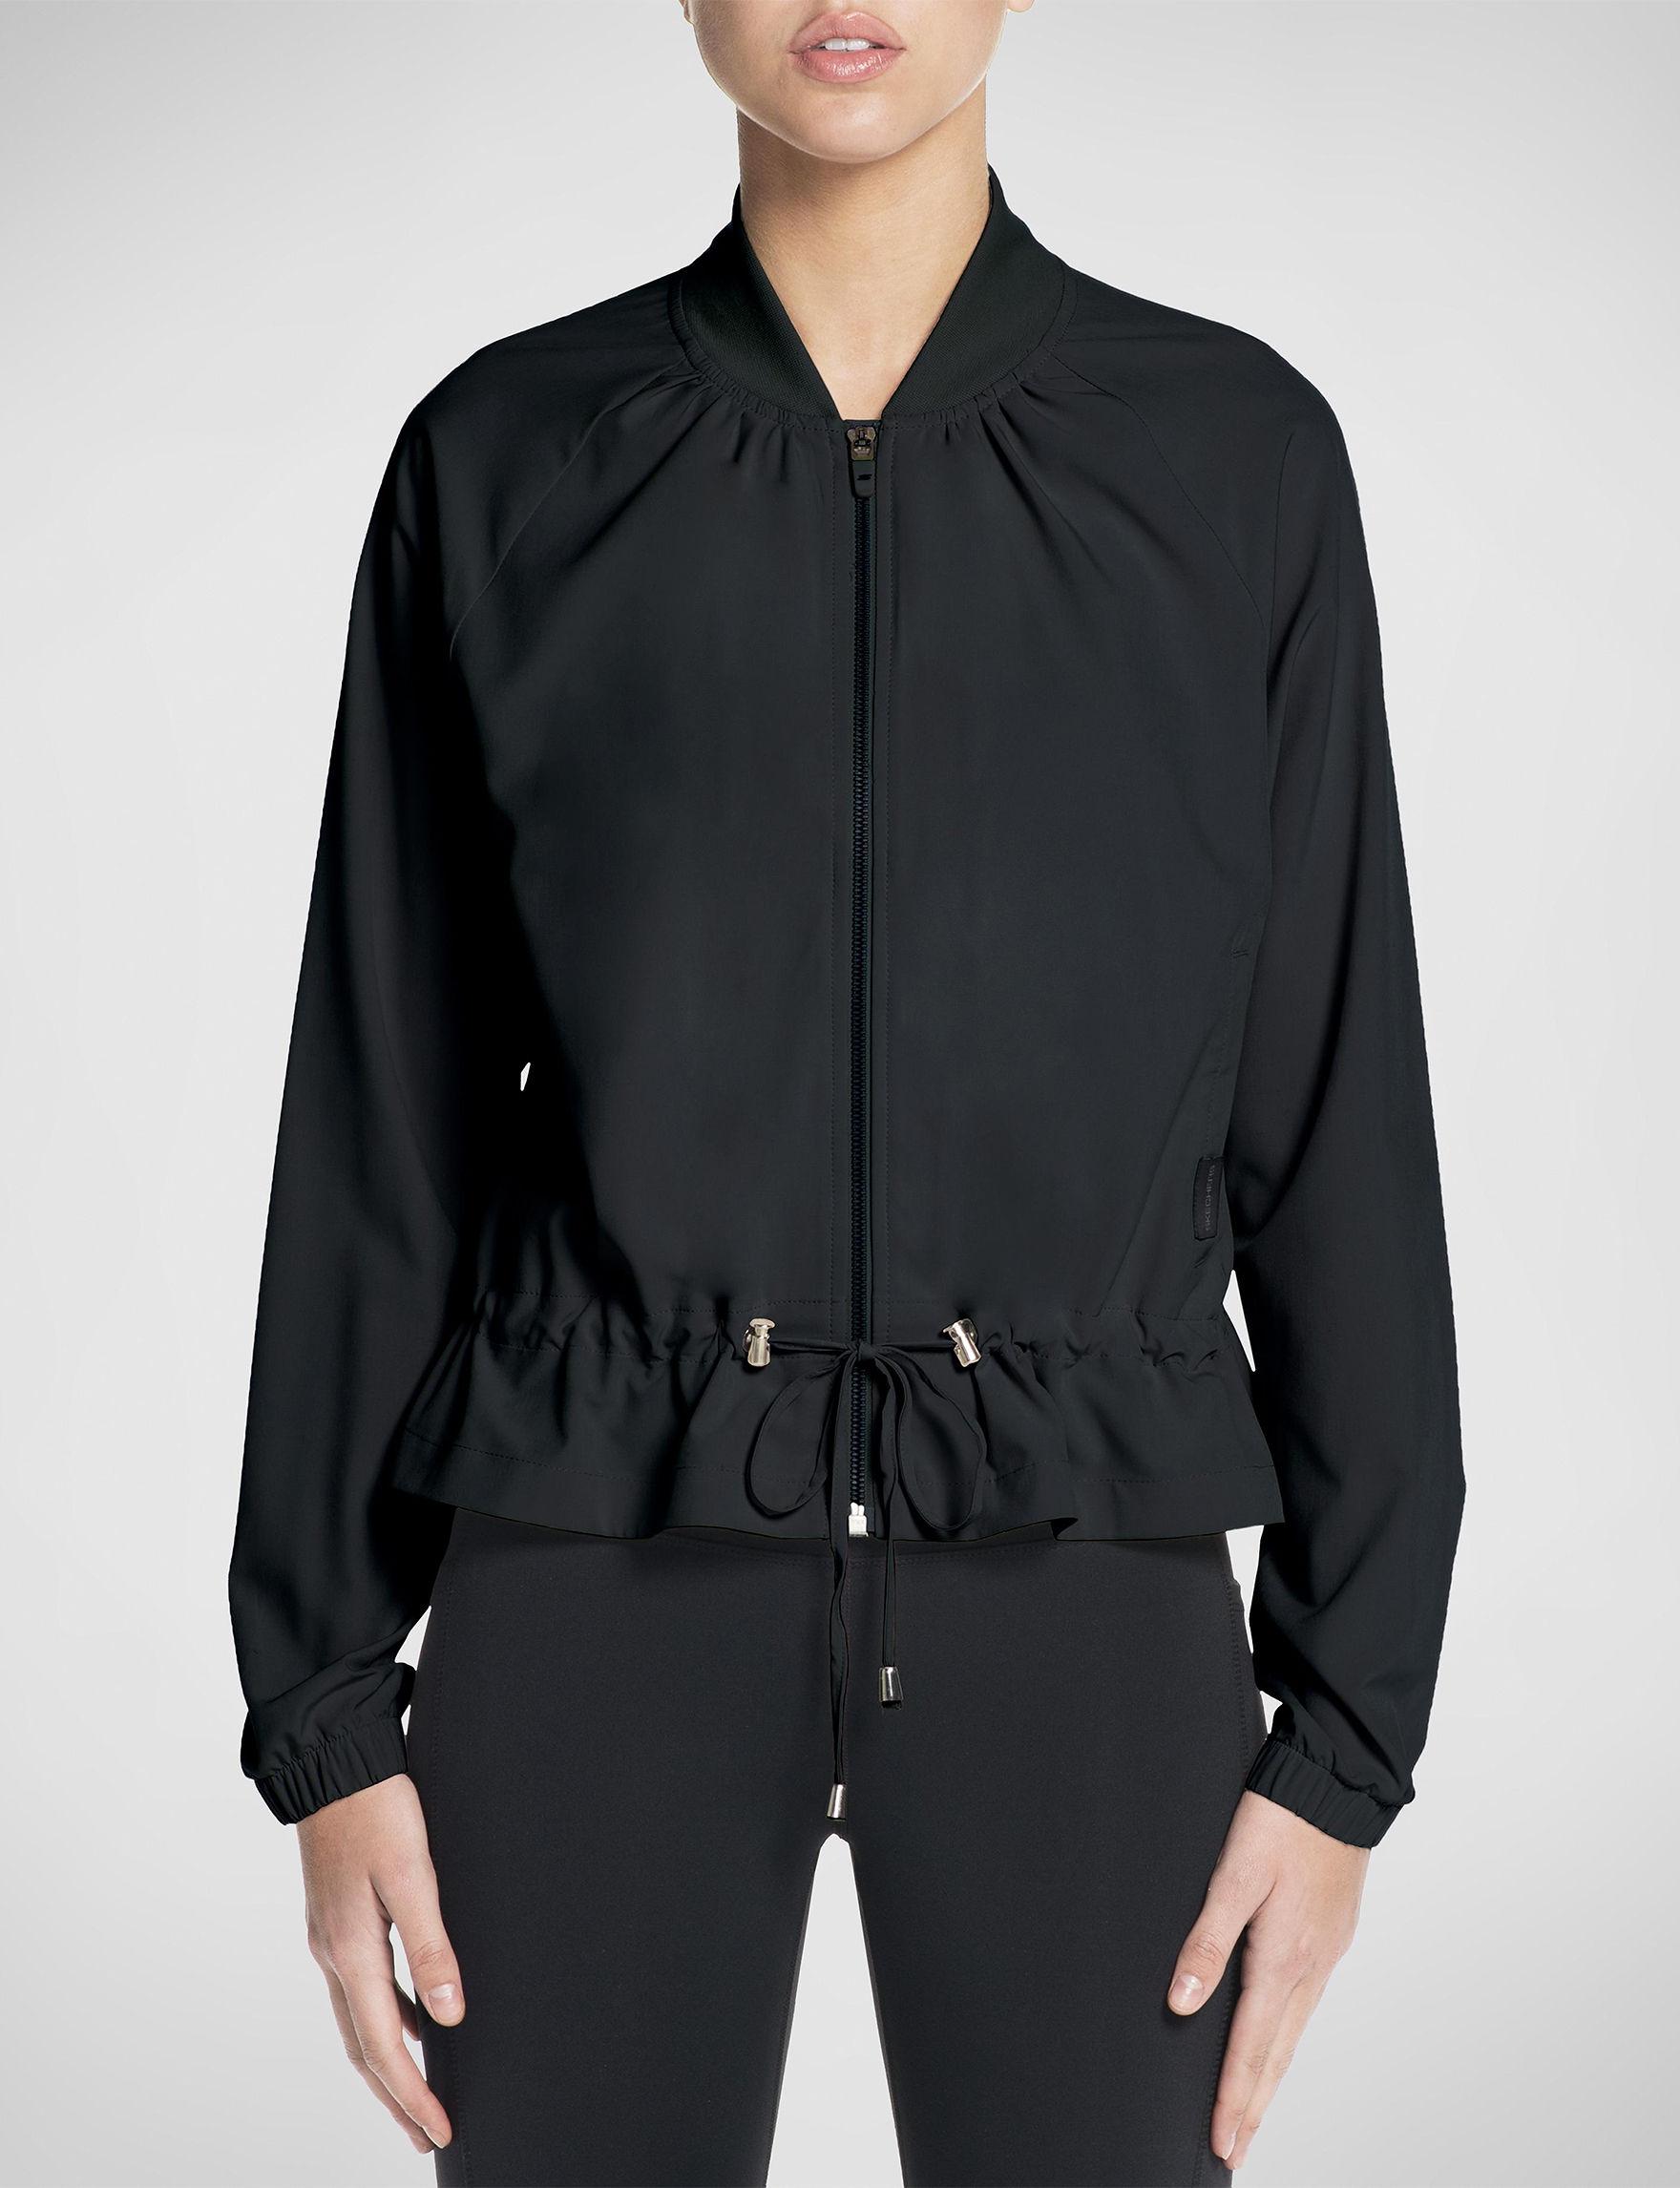 Skechers Black Lightweight Jackets & Blazers